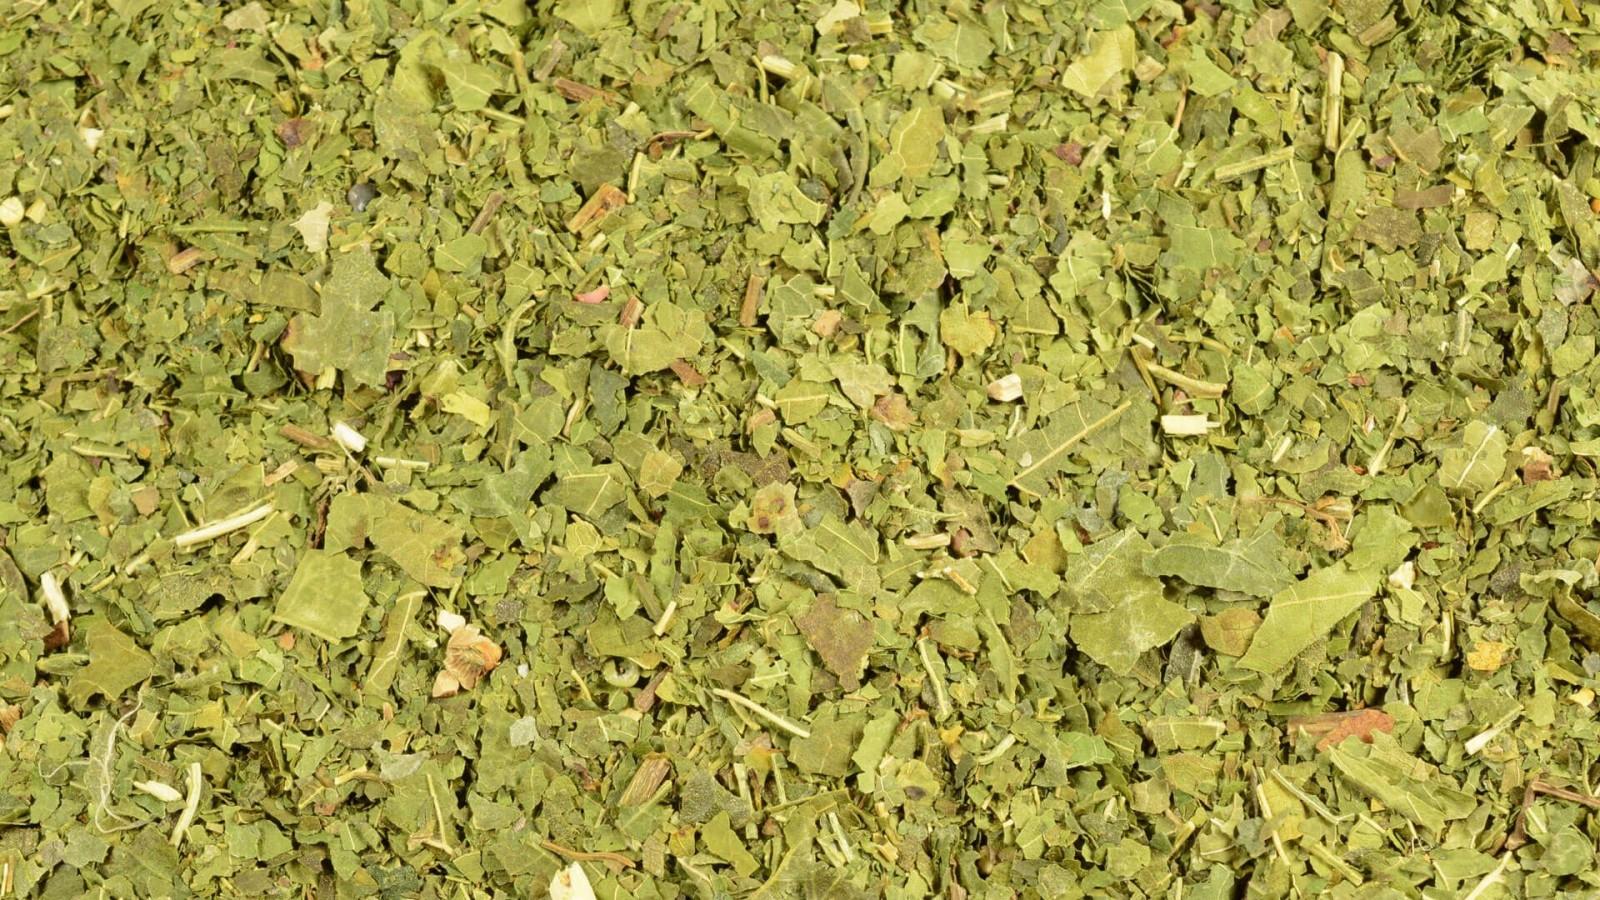 Morwa biała cena suszona herbata 500g